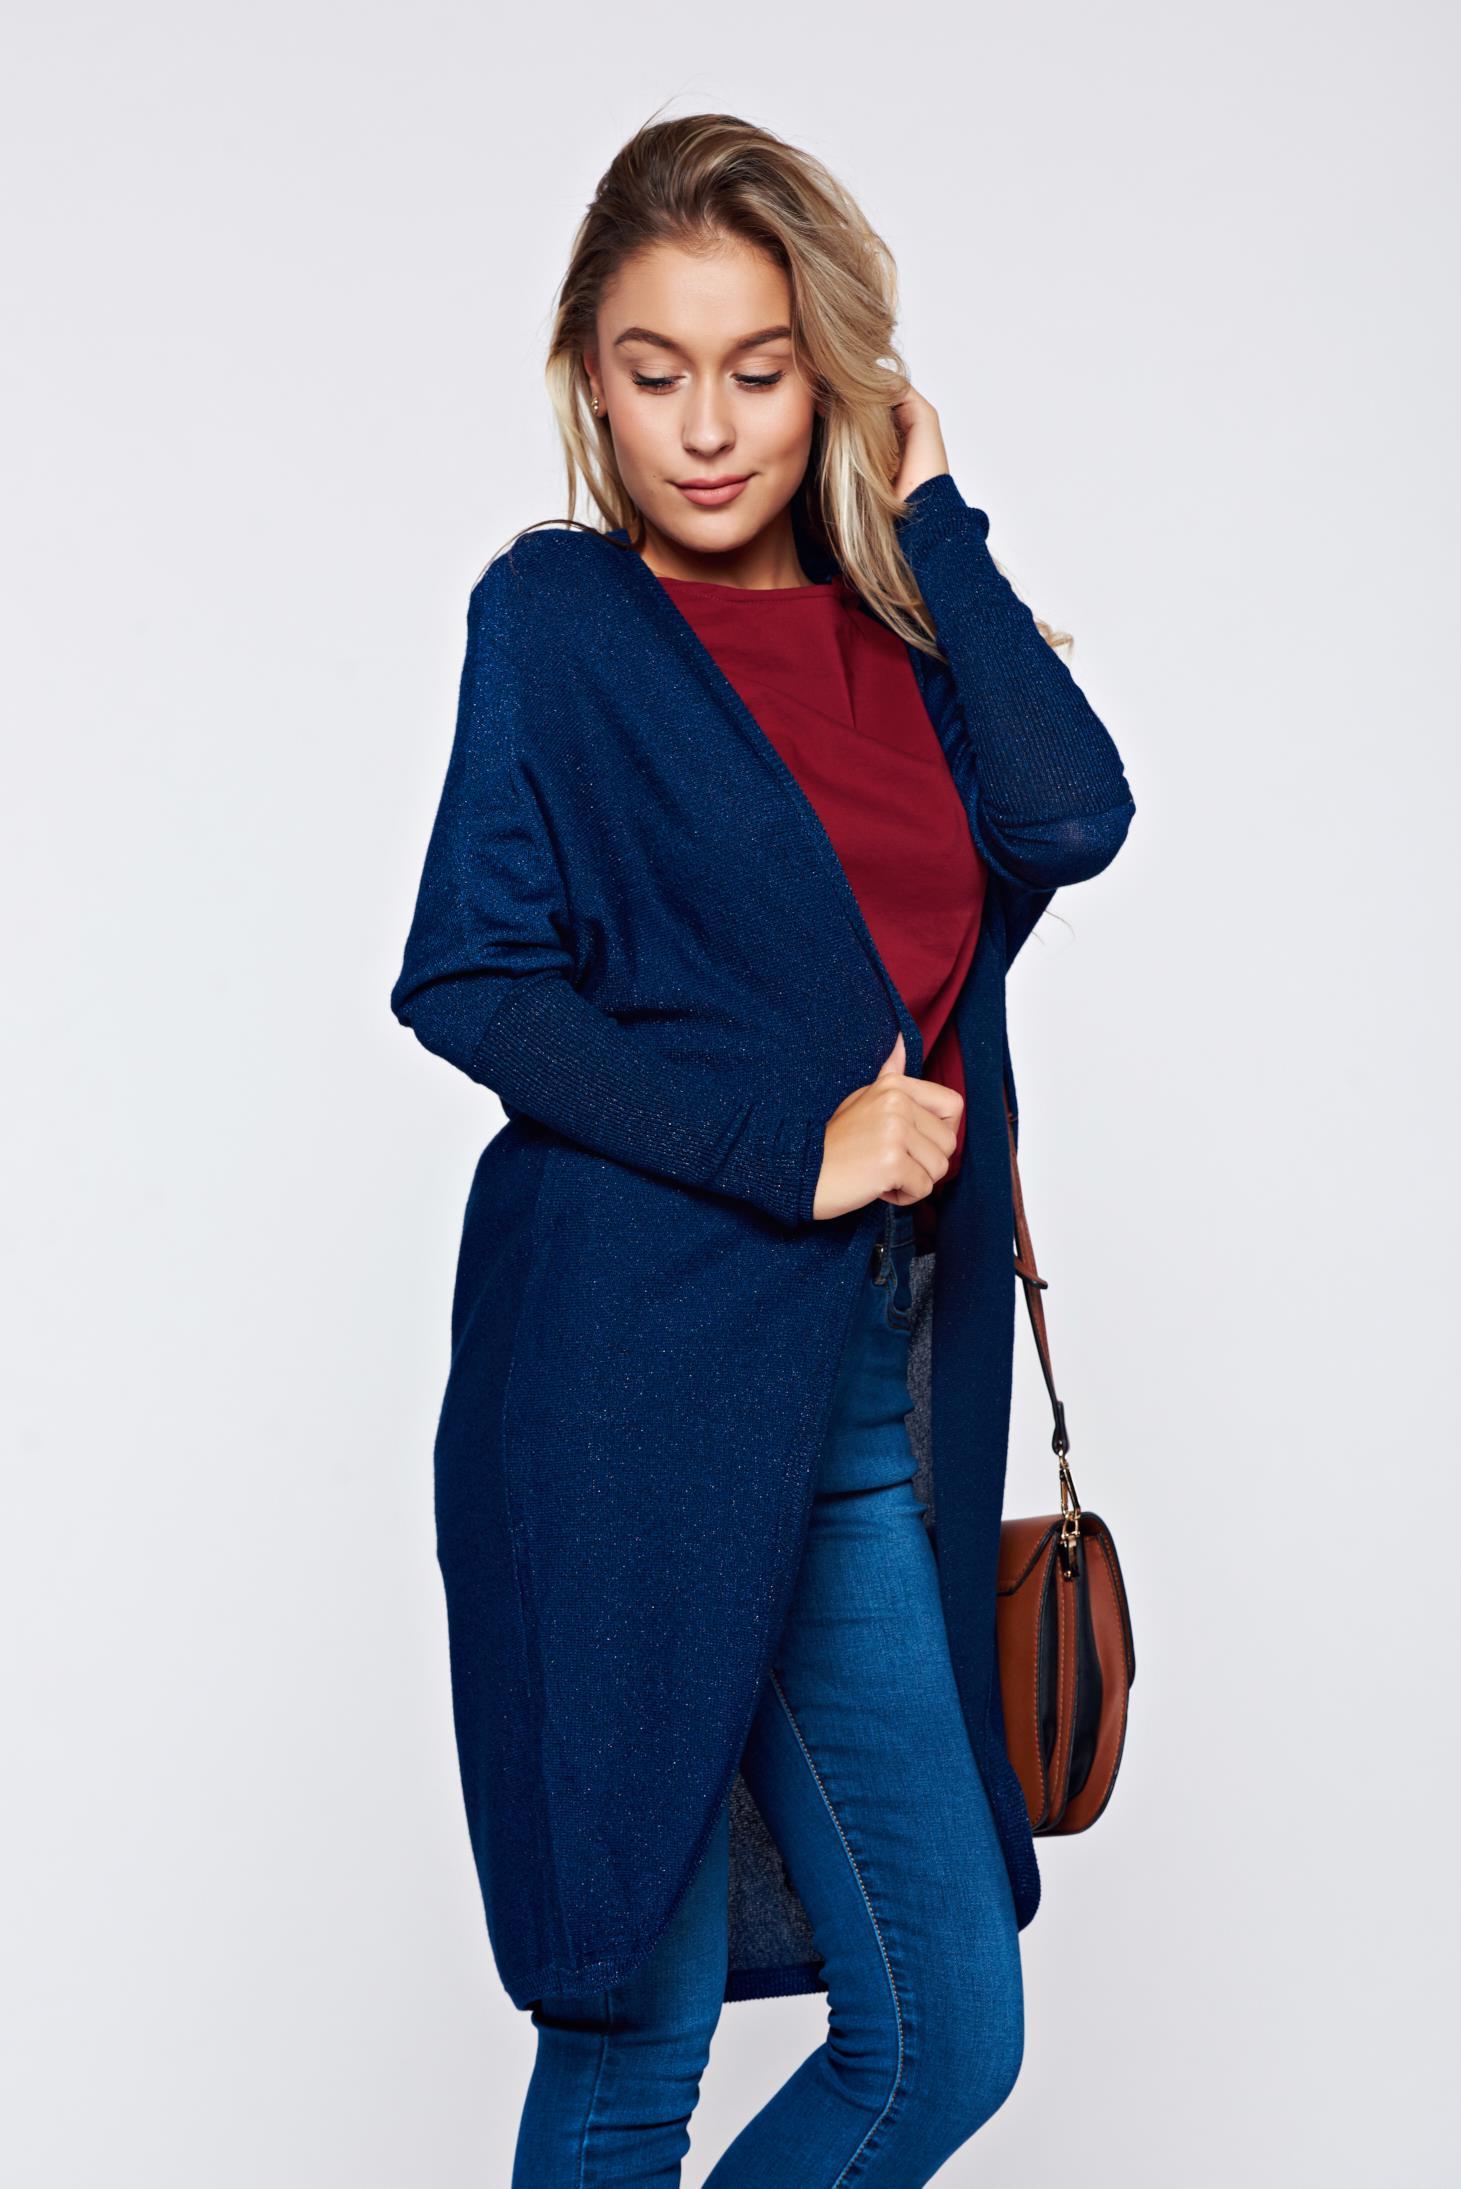 Cardigan Top Secret albastru-inchis casual cu croi larg tricotat